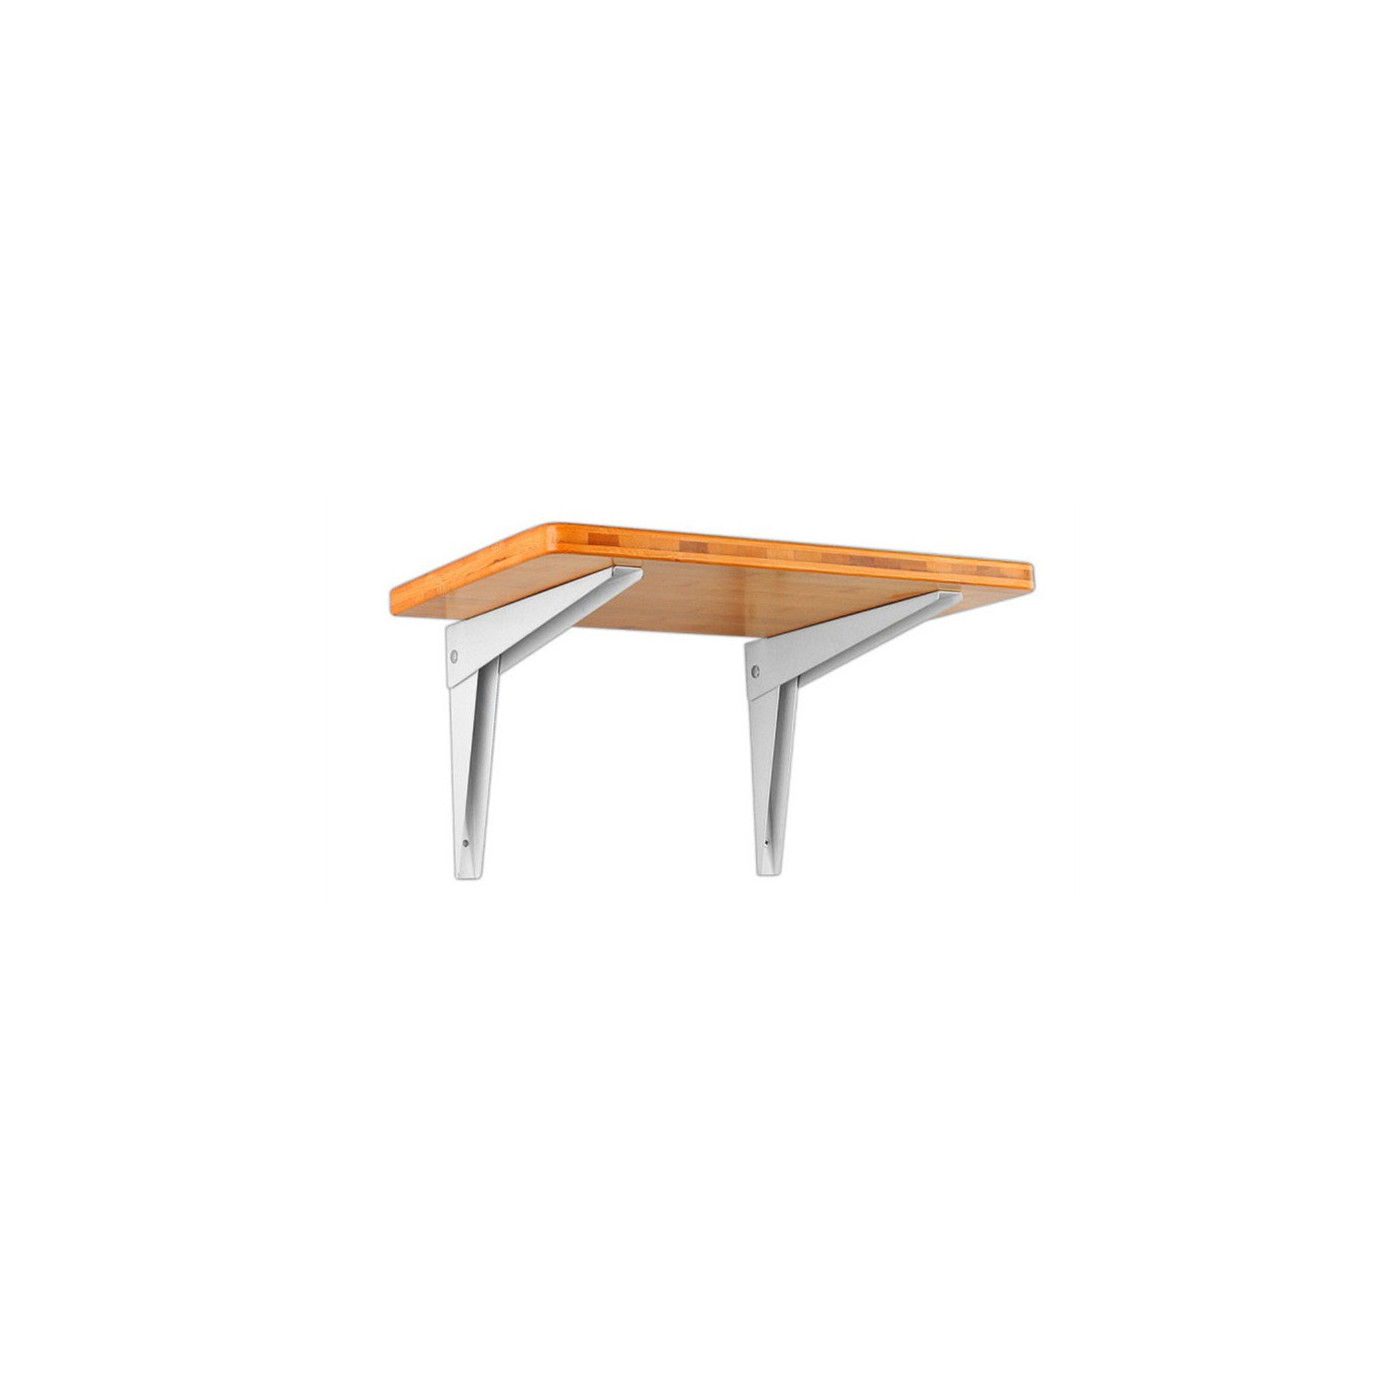 Set of 4 foldable shelf support brackets (size 2: 35 cm)